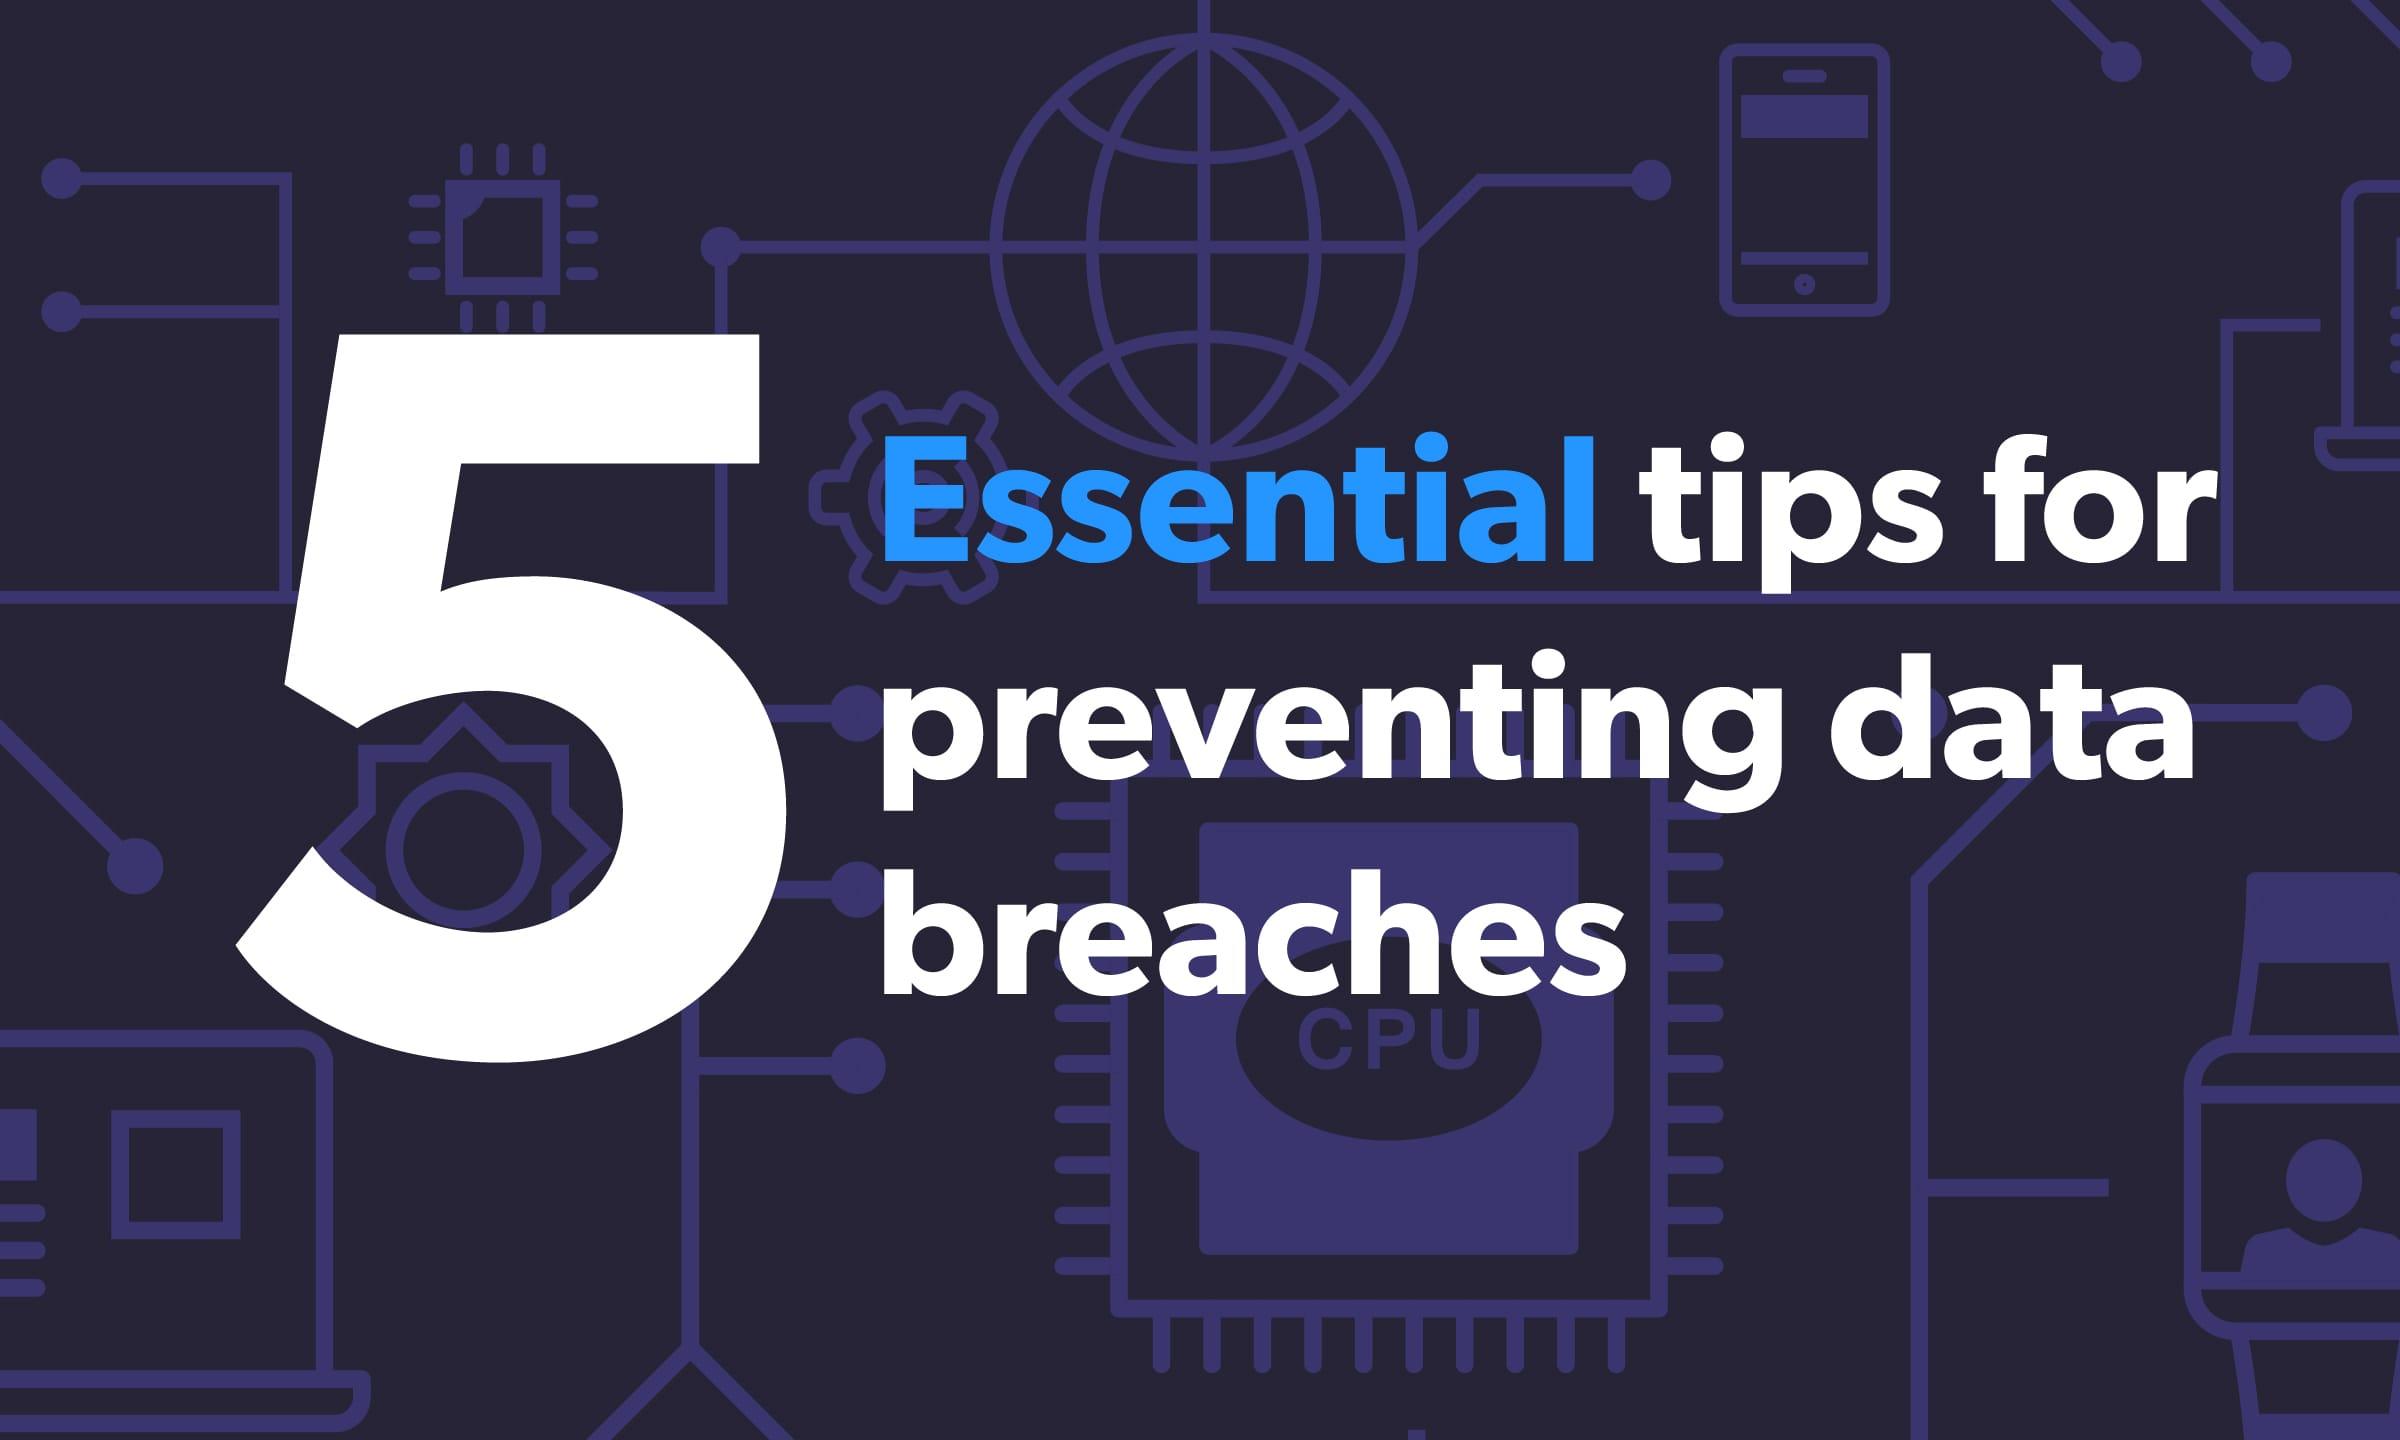 Steps to Prevent Data Breaches